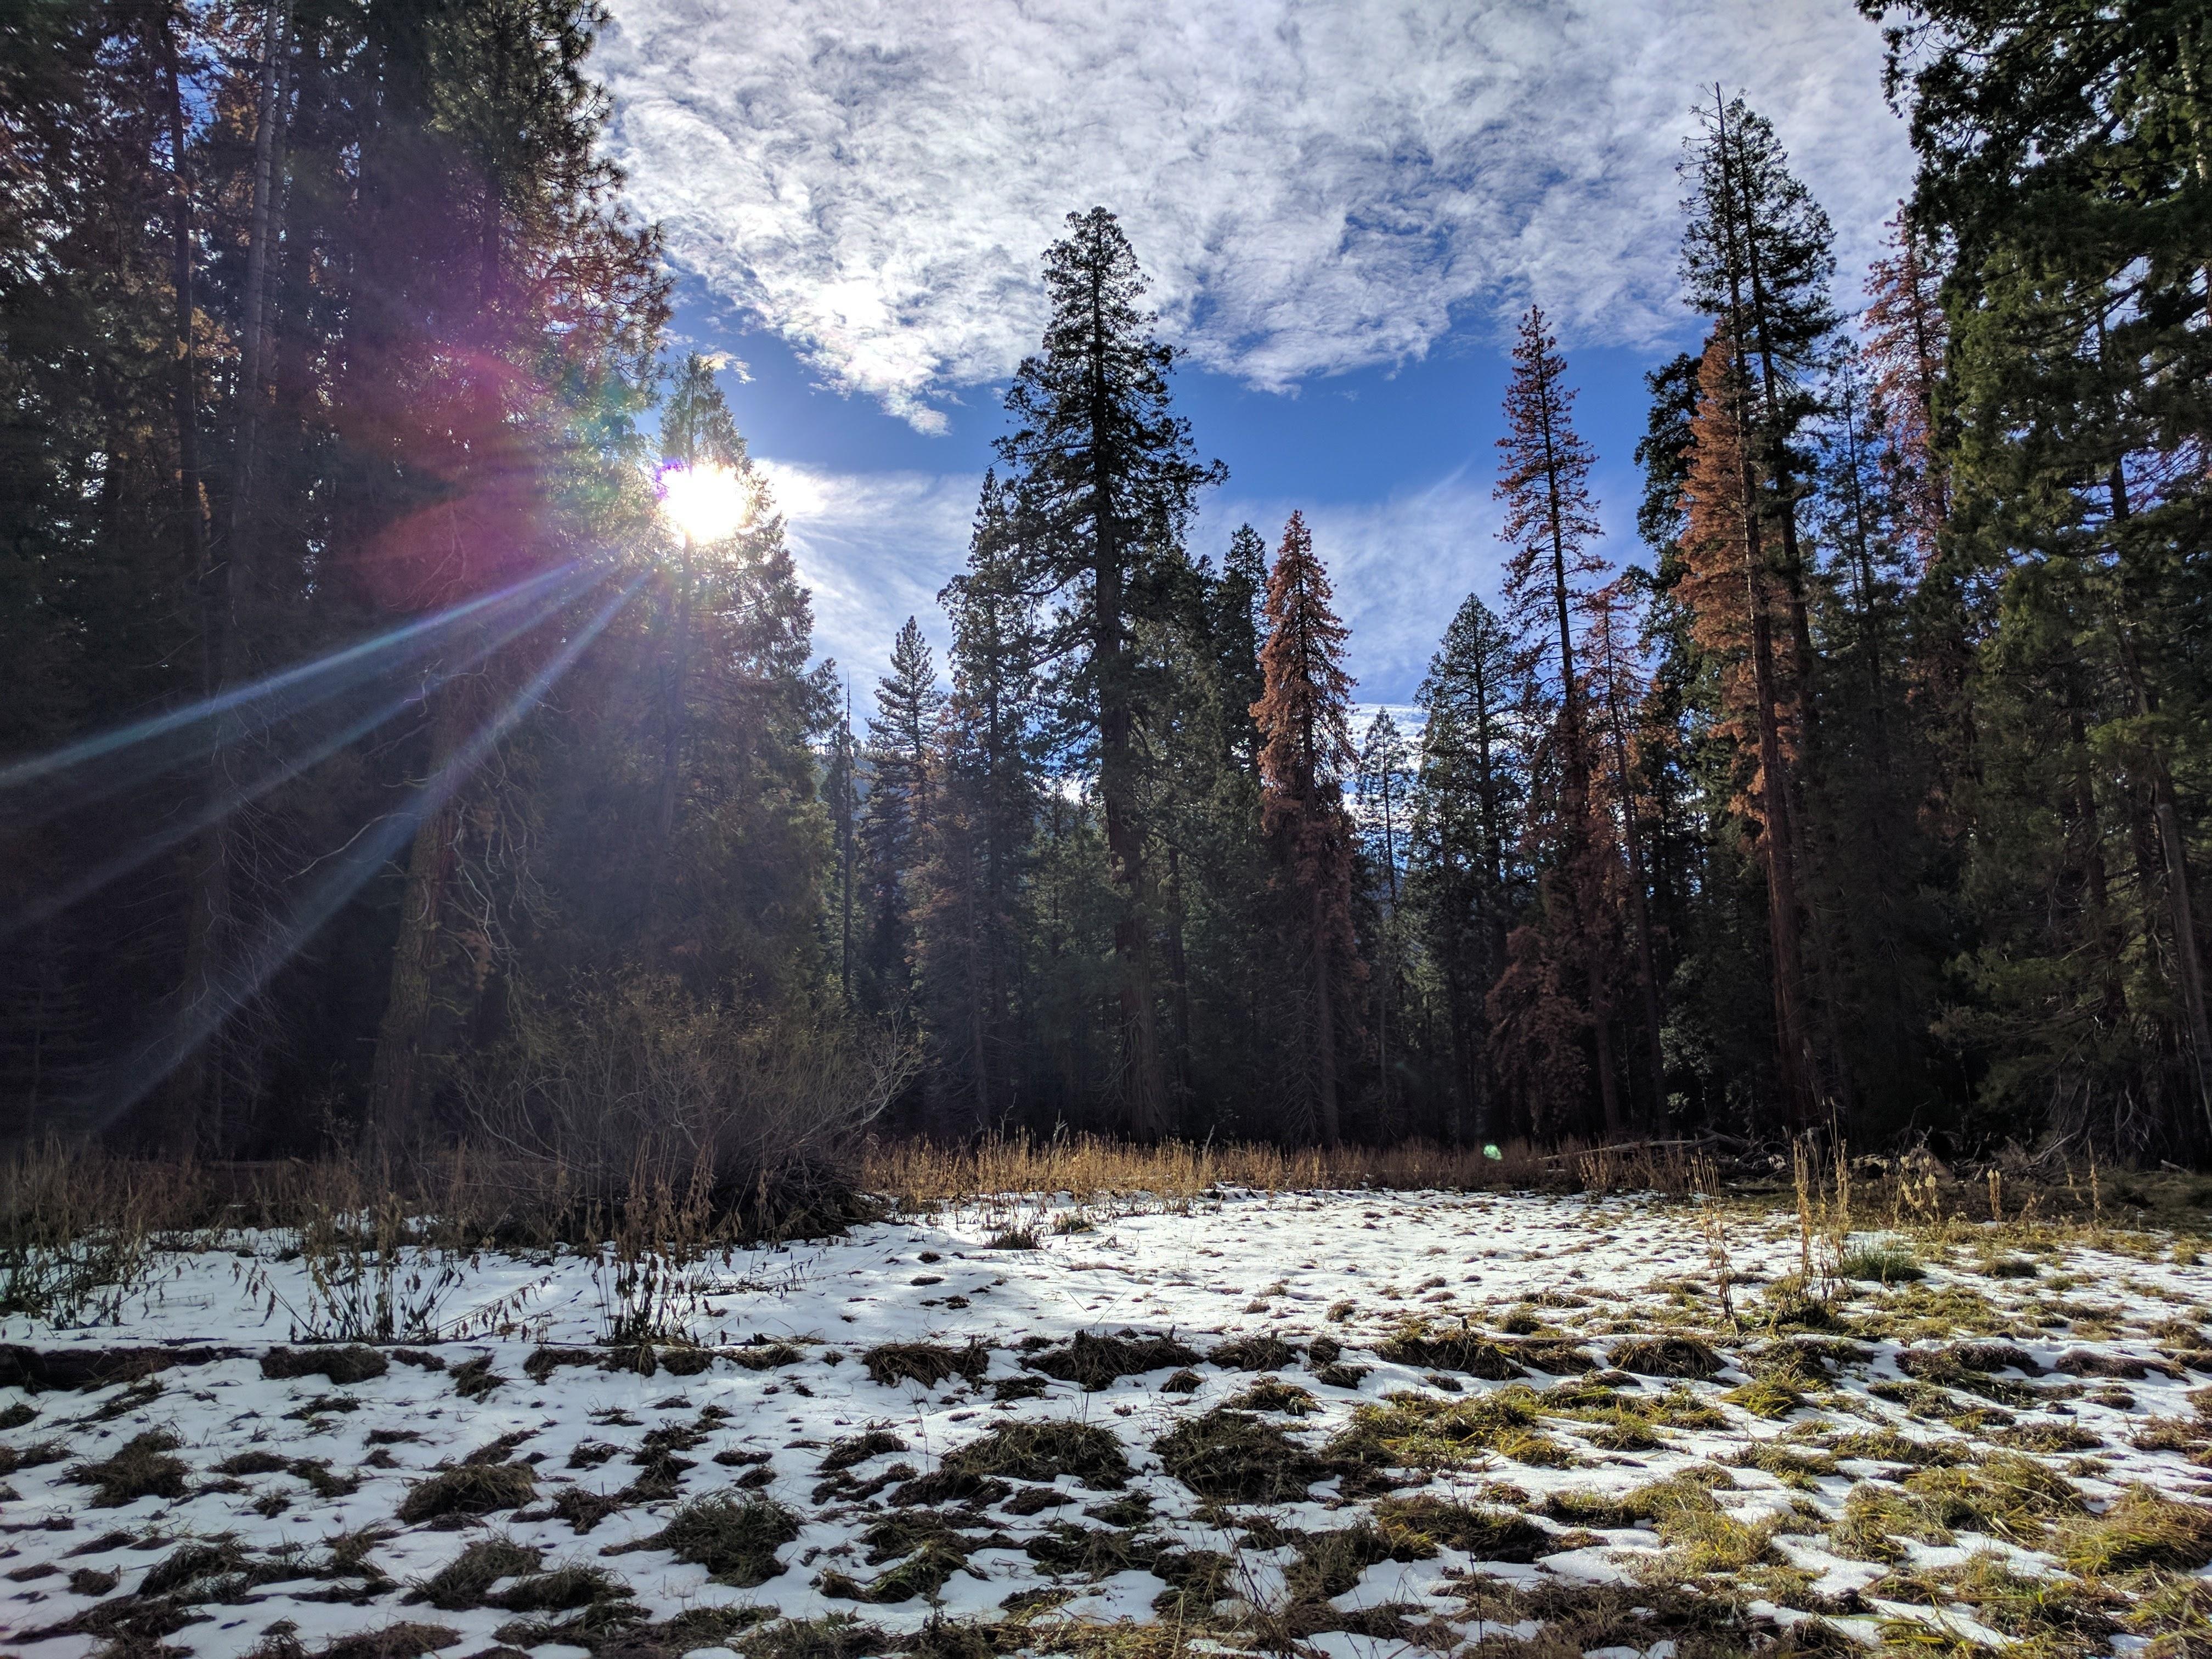 Sequoia Meadow [4032  3024] [OC]